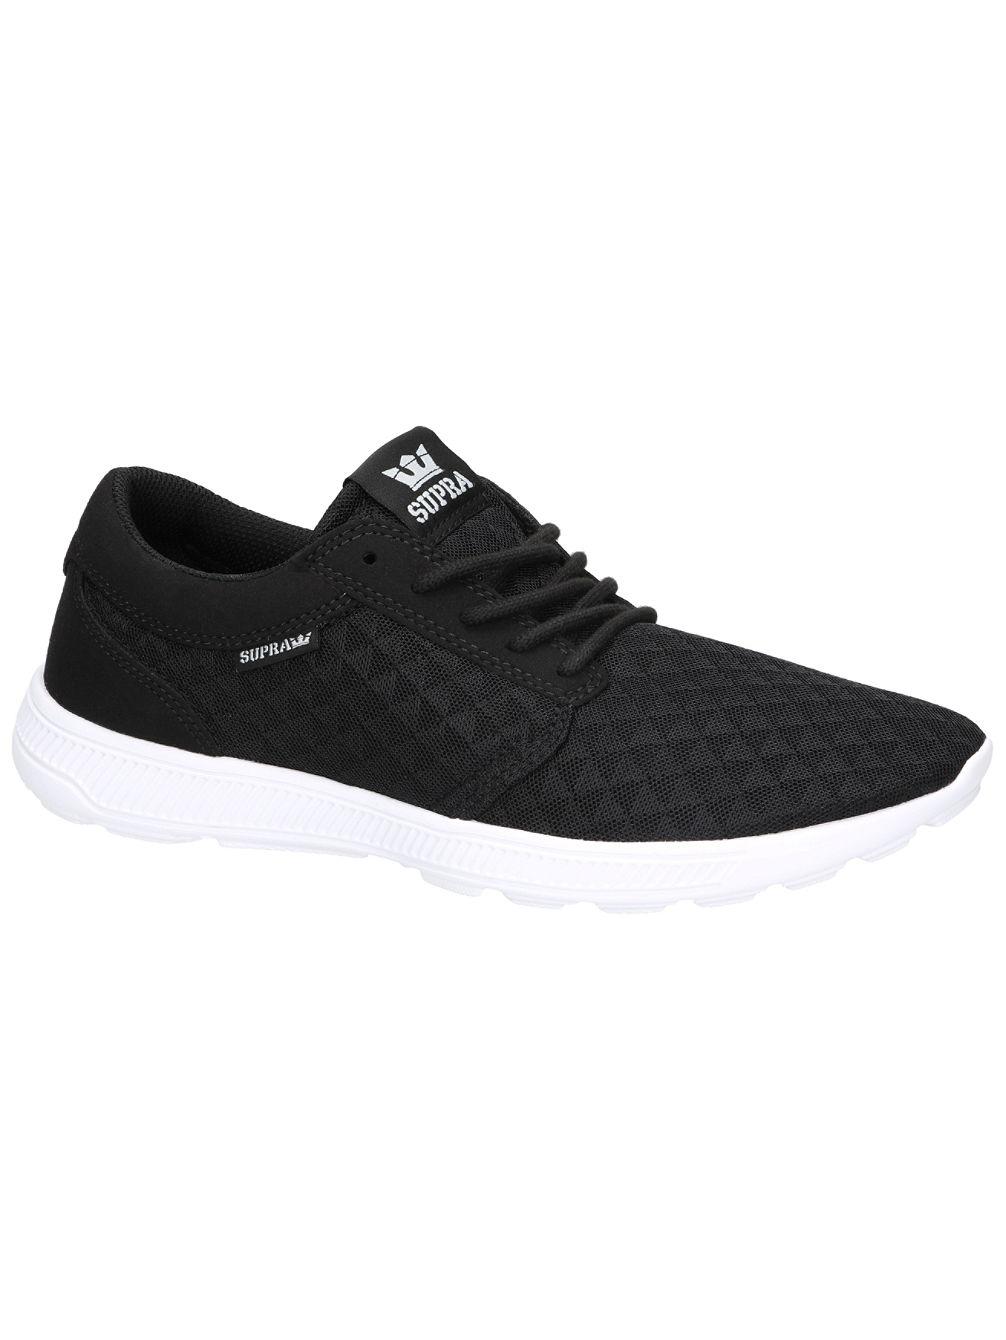 4bd78517c85 Buy Supra Hammer Run Sneakers online at Blue Tomato